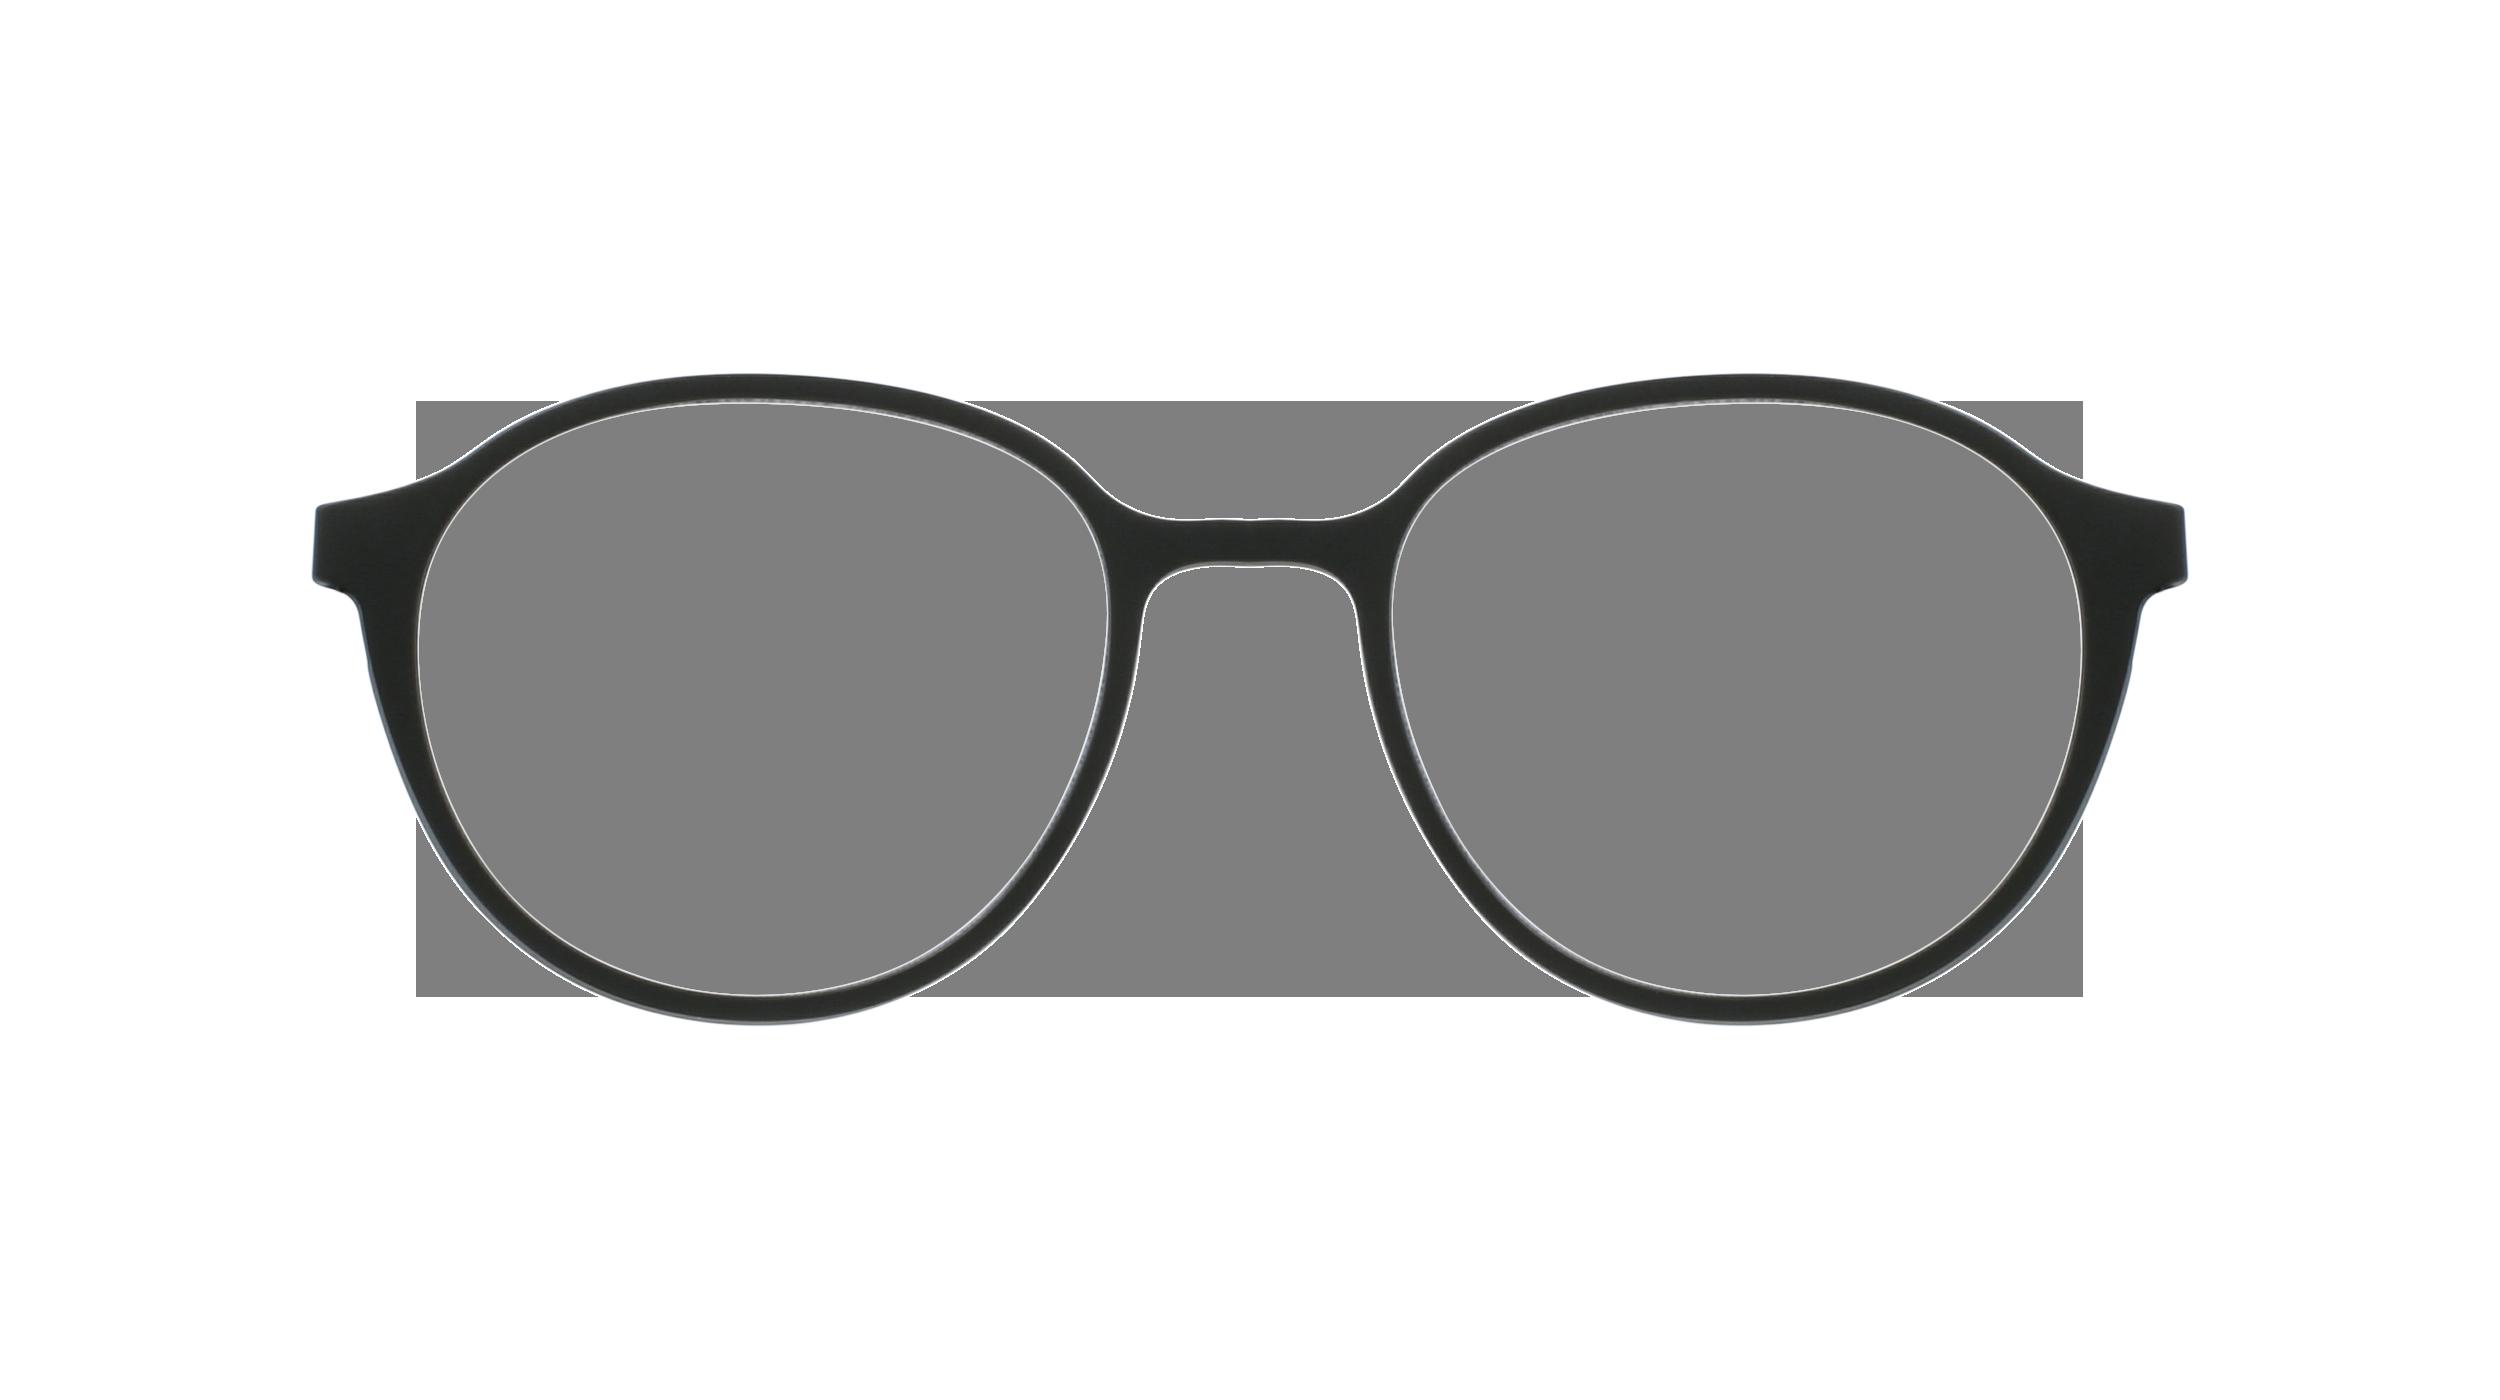 afflelou/france/products/smart_clip/clips_glasses/07630036458792.png